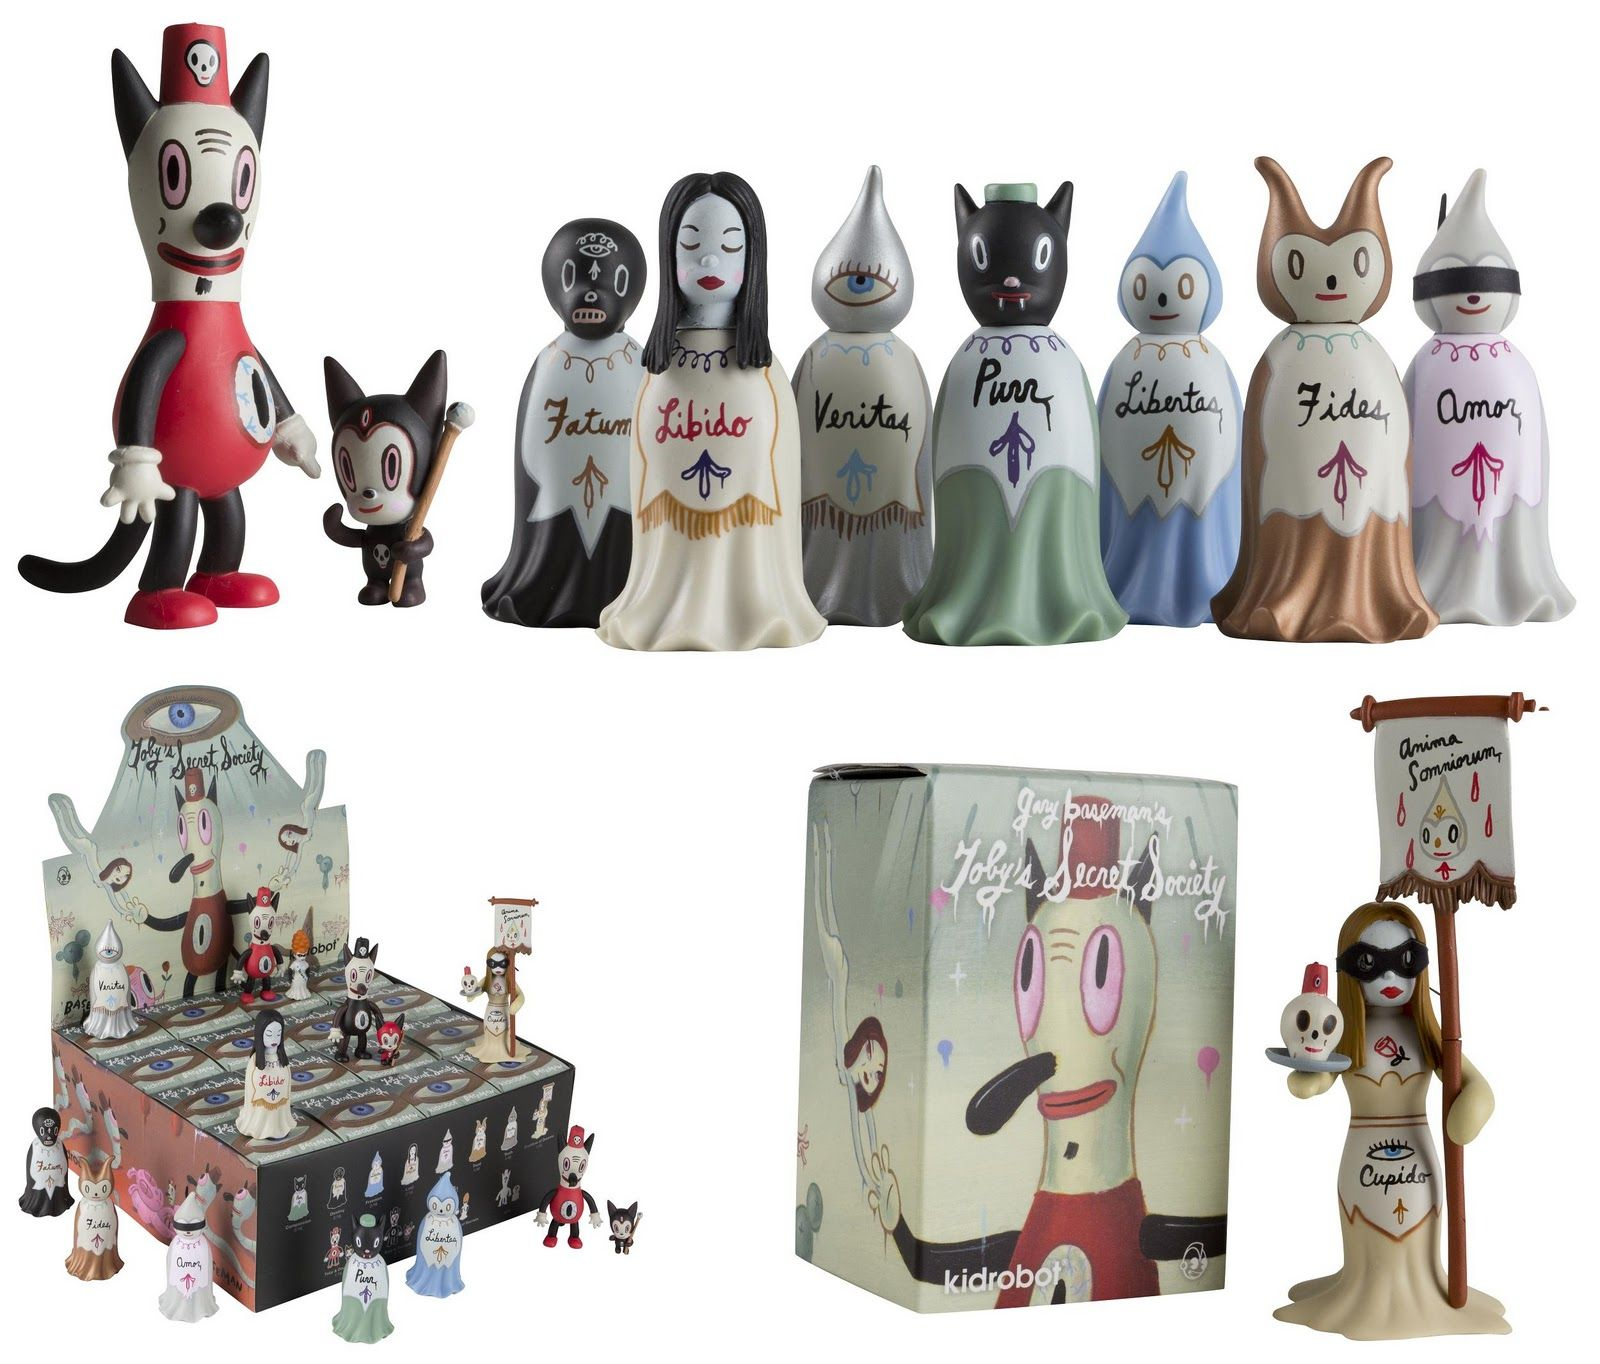 Pin On Designer Art Toys Characters Design Illustration